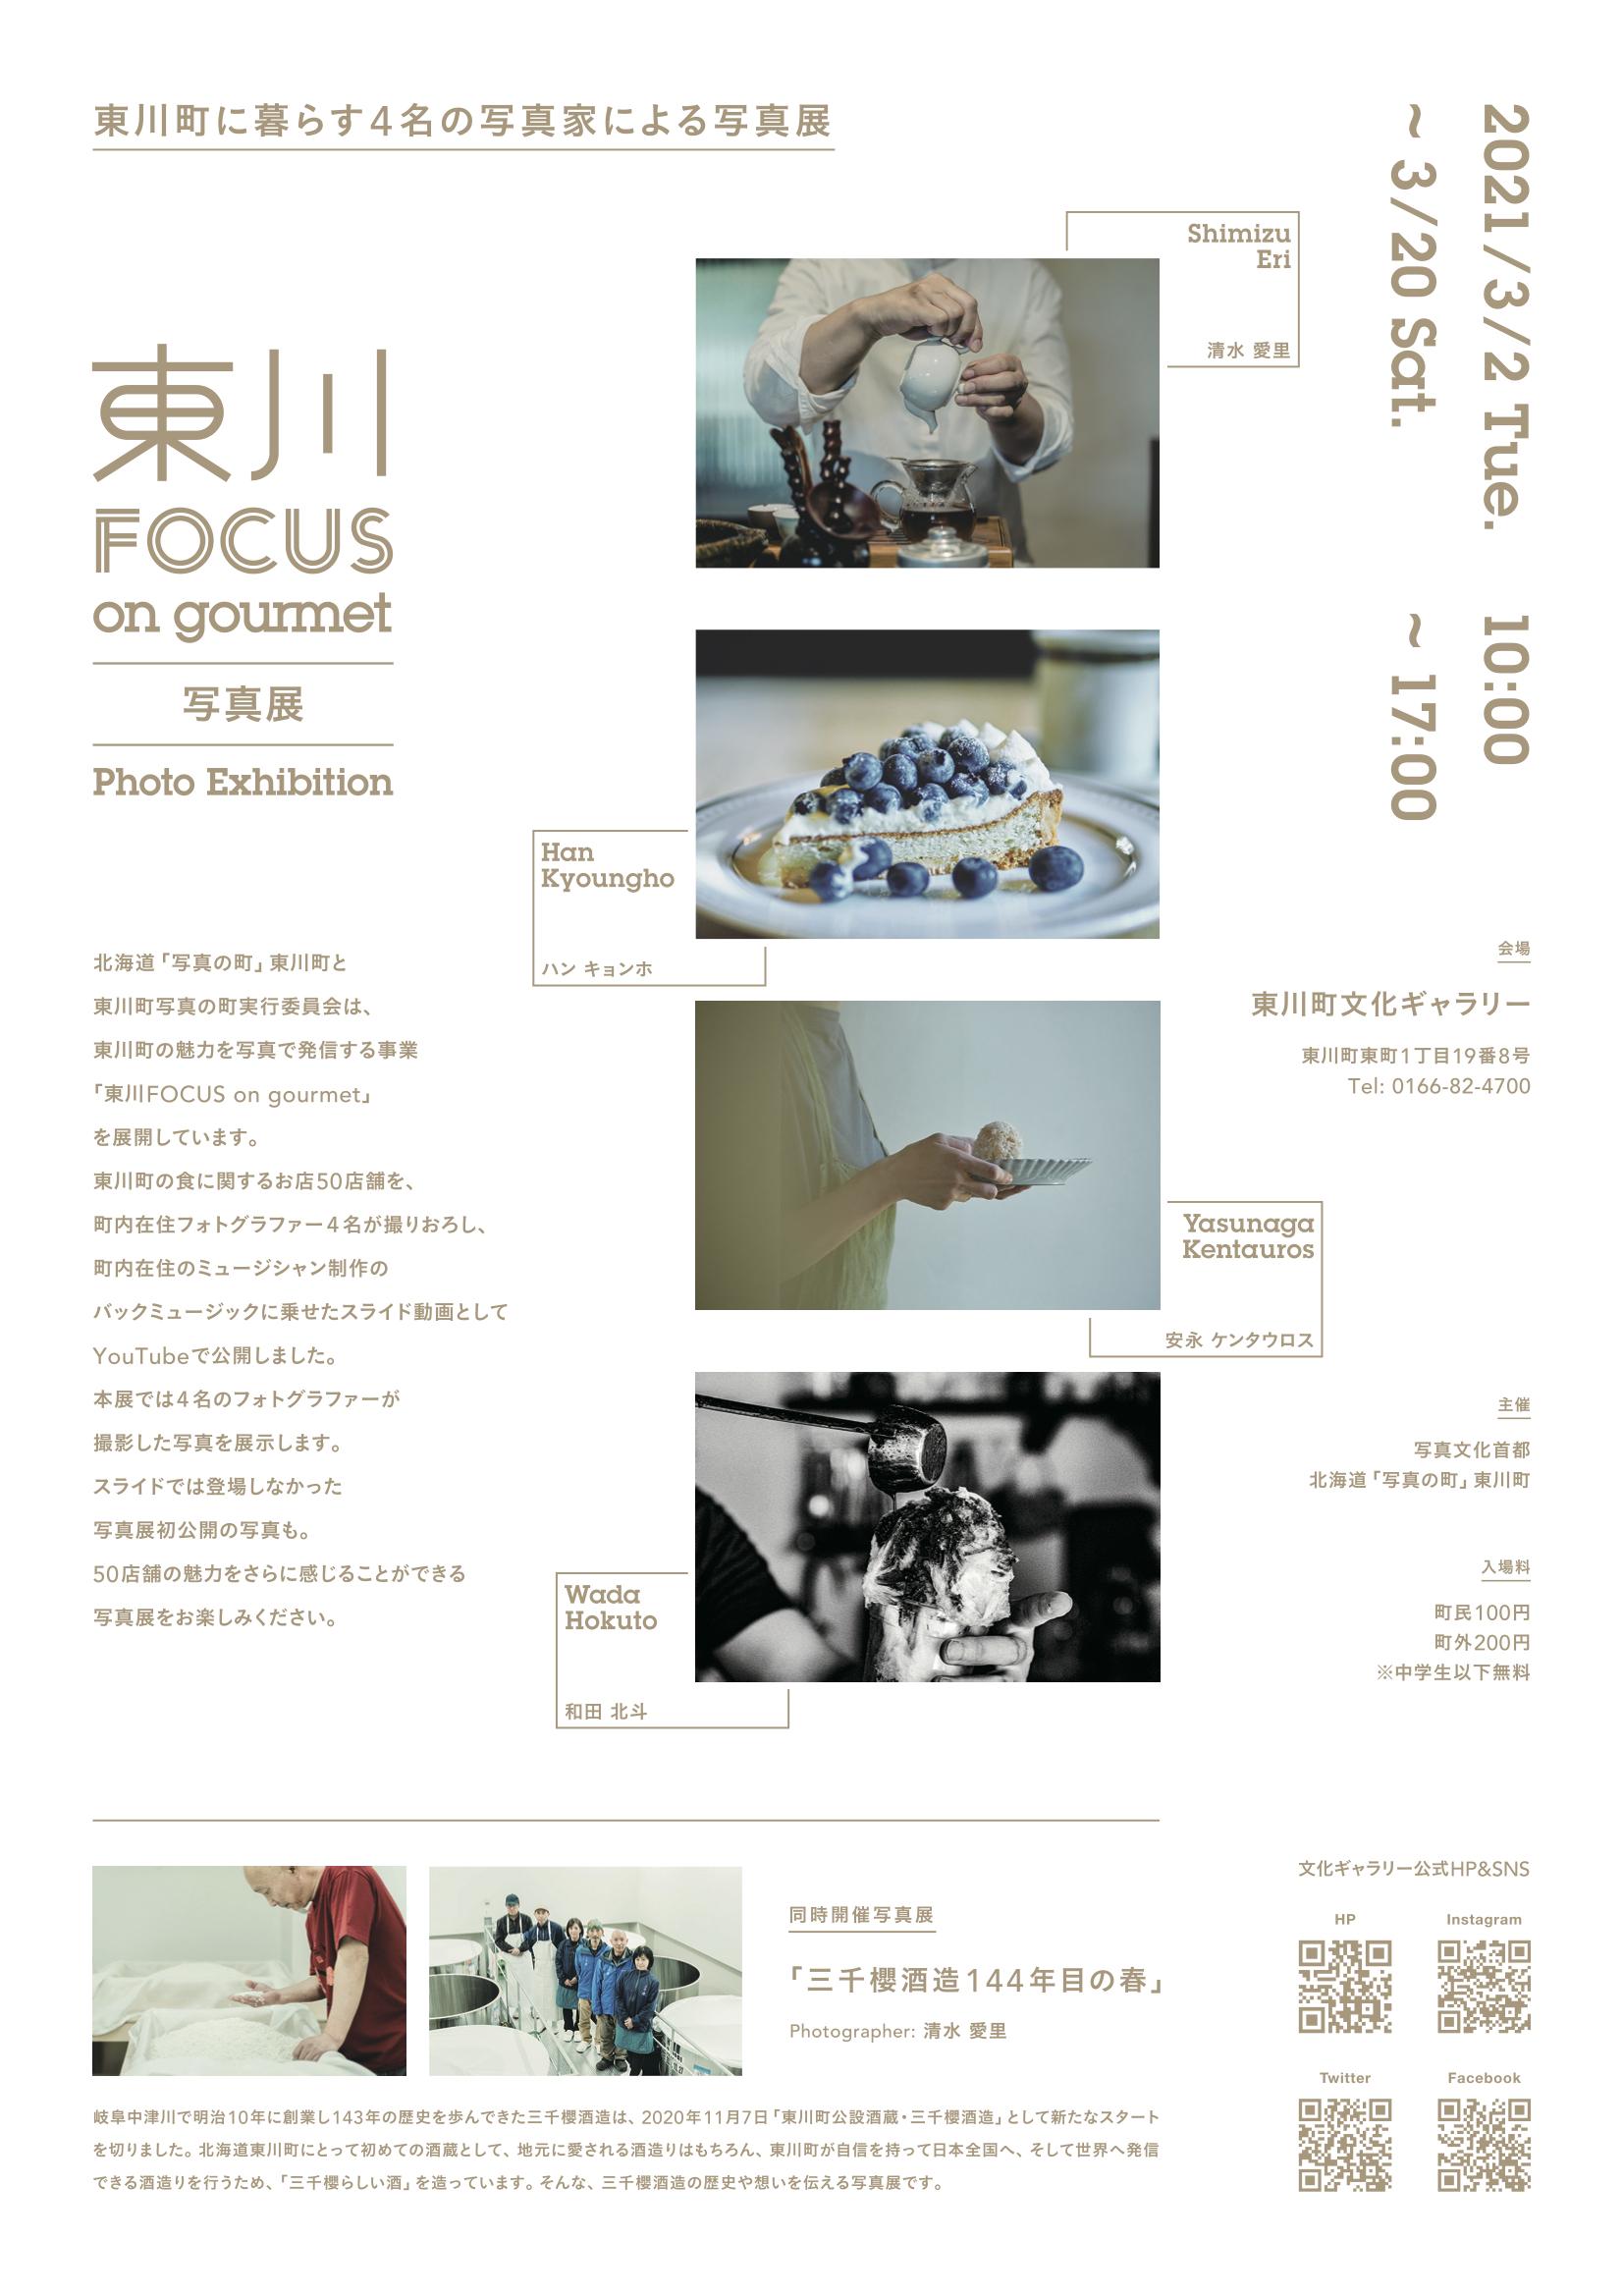 東川FOCUS on gourmet写真展 / 三千櫻酒造144年目の春